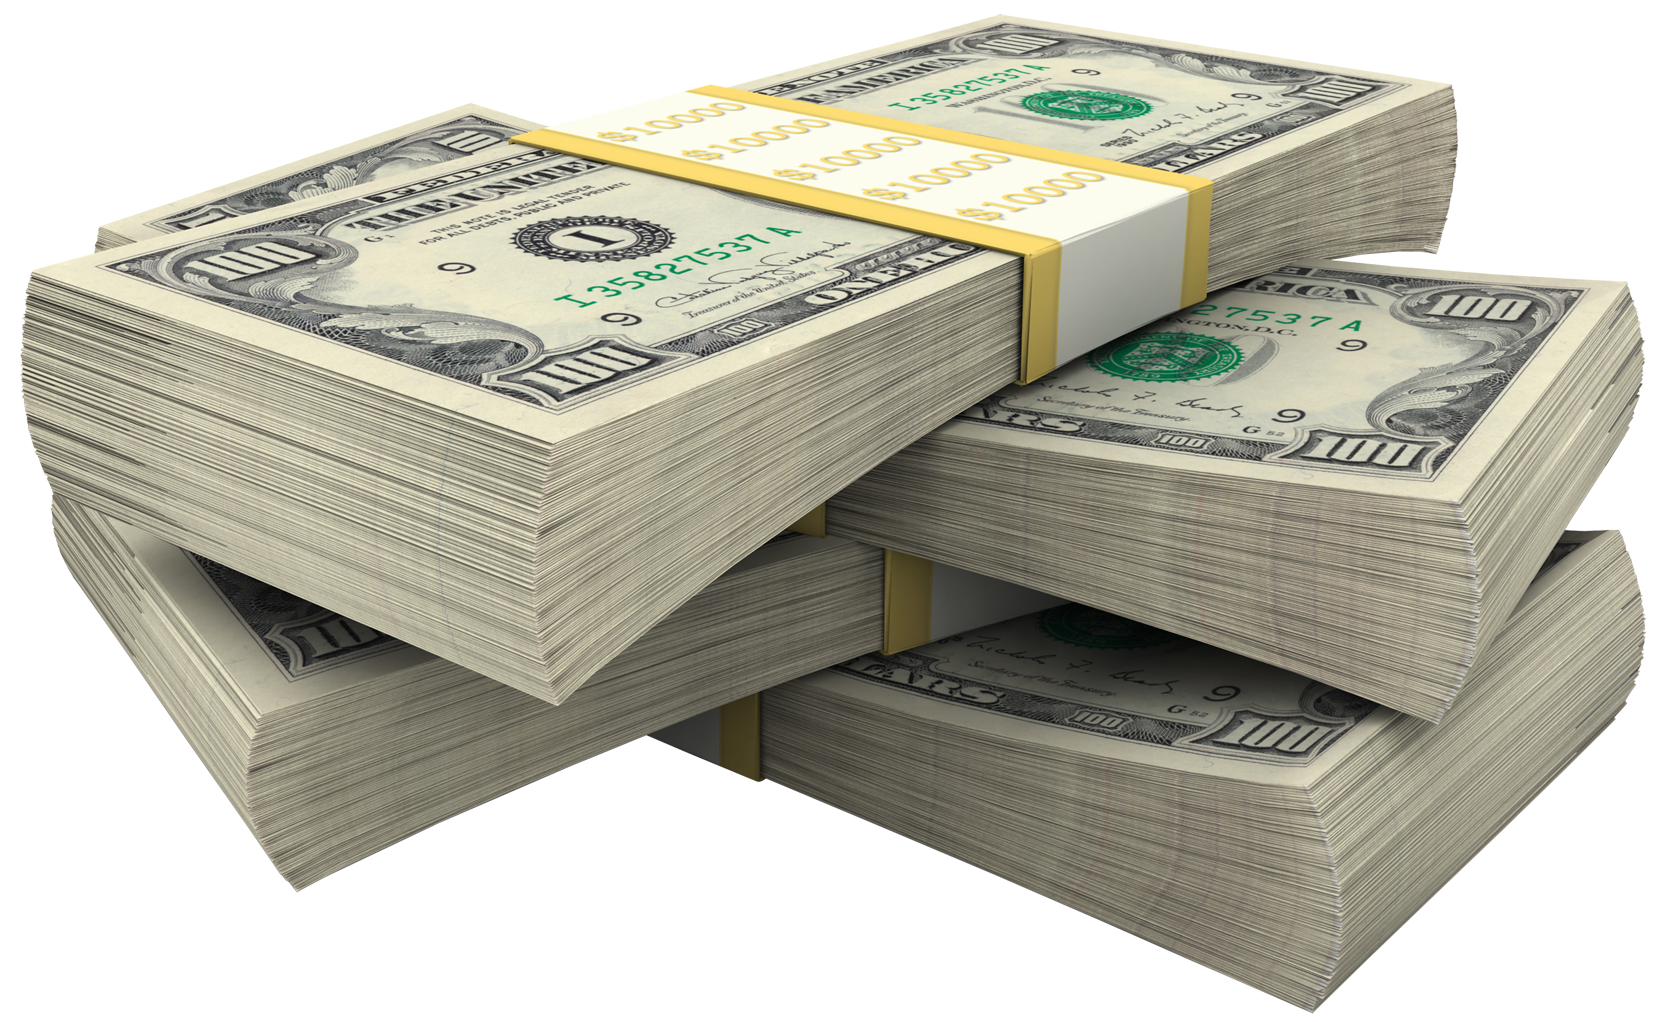 Economy clipart 100 dollar. Bulls unwind post fomc